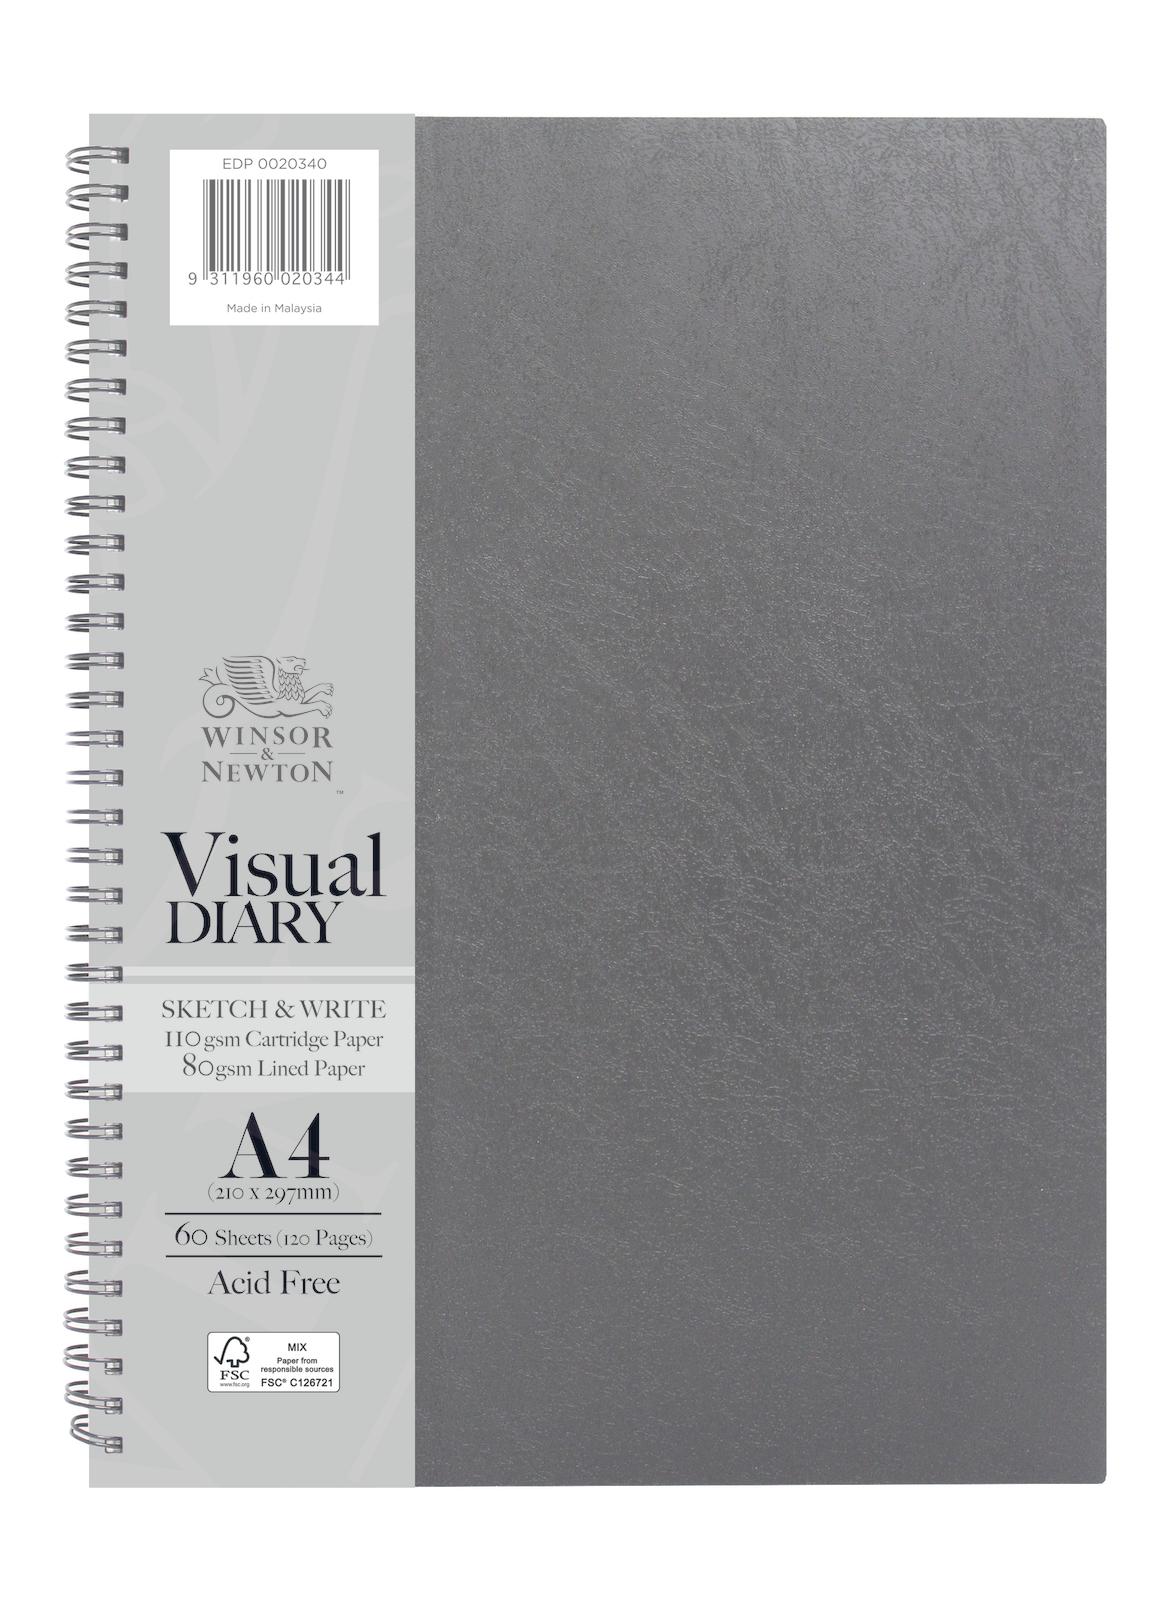 Winsor & Newton: A4 Sketch & Write Diary 110gsm/80gsm FSC Mix Credit image